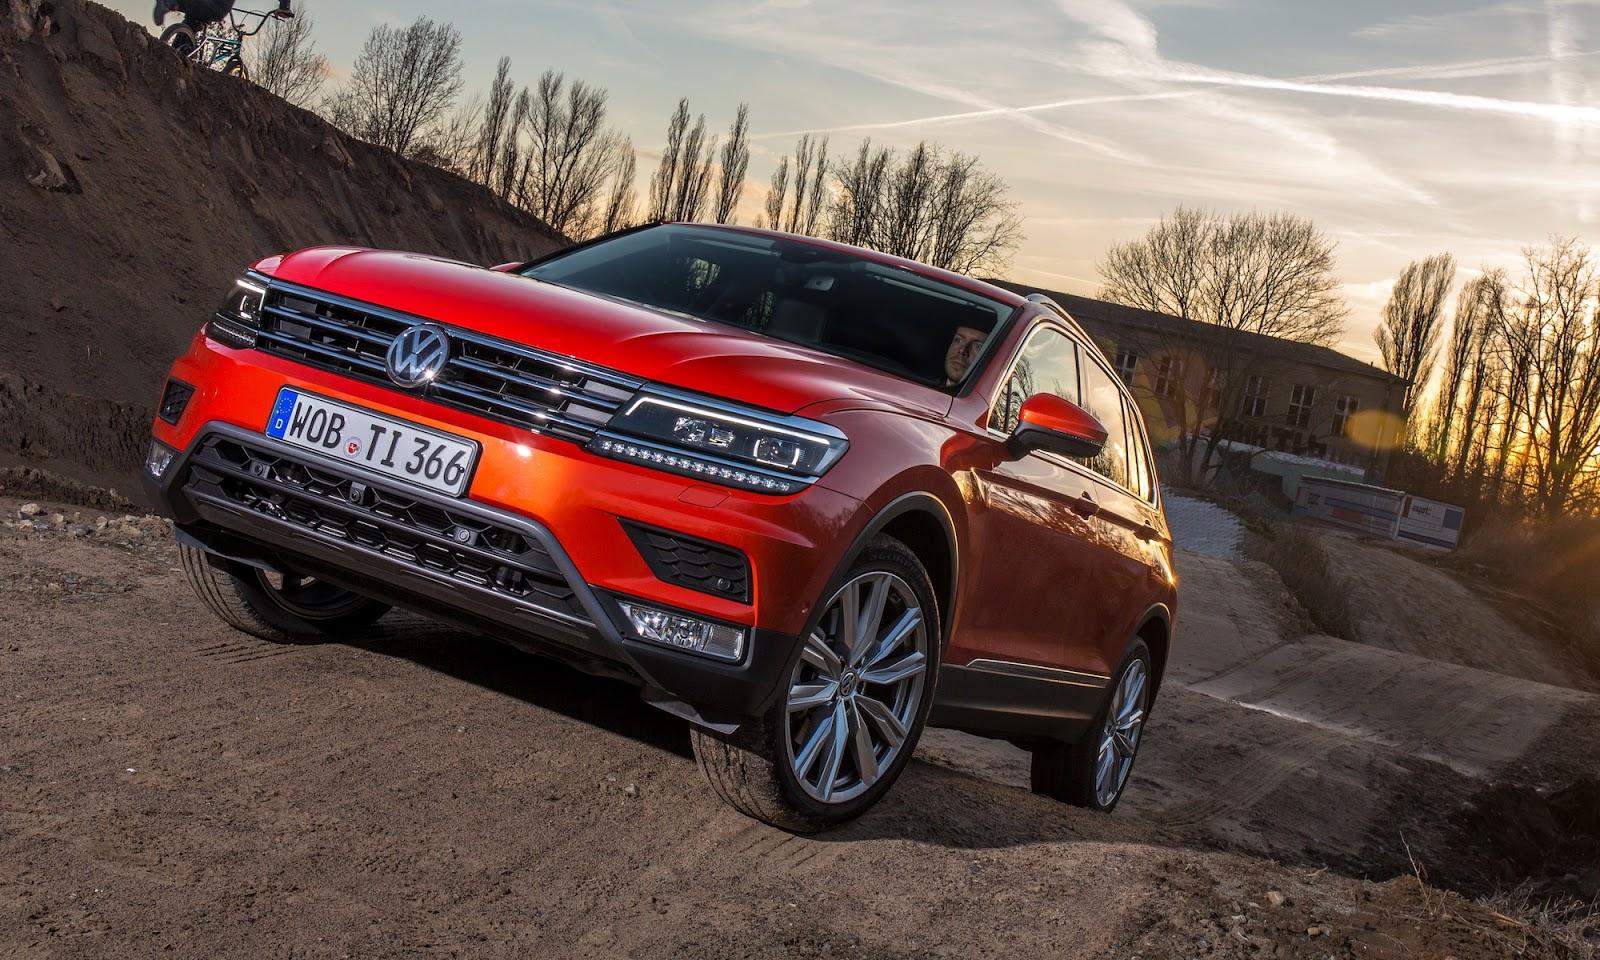 Đánh giá xe Volkswagen Tiguan 2016